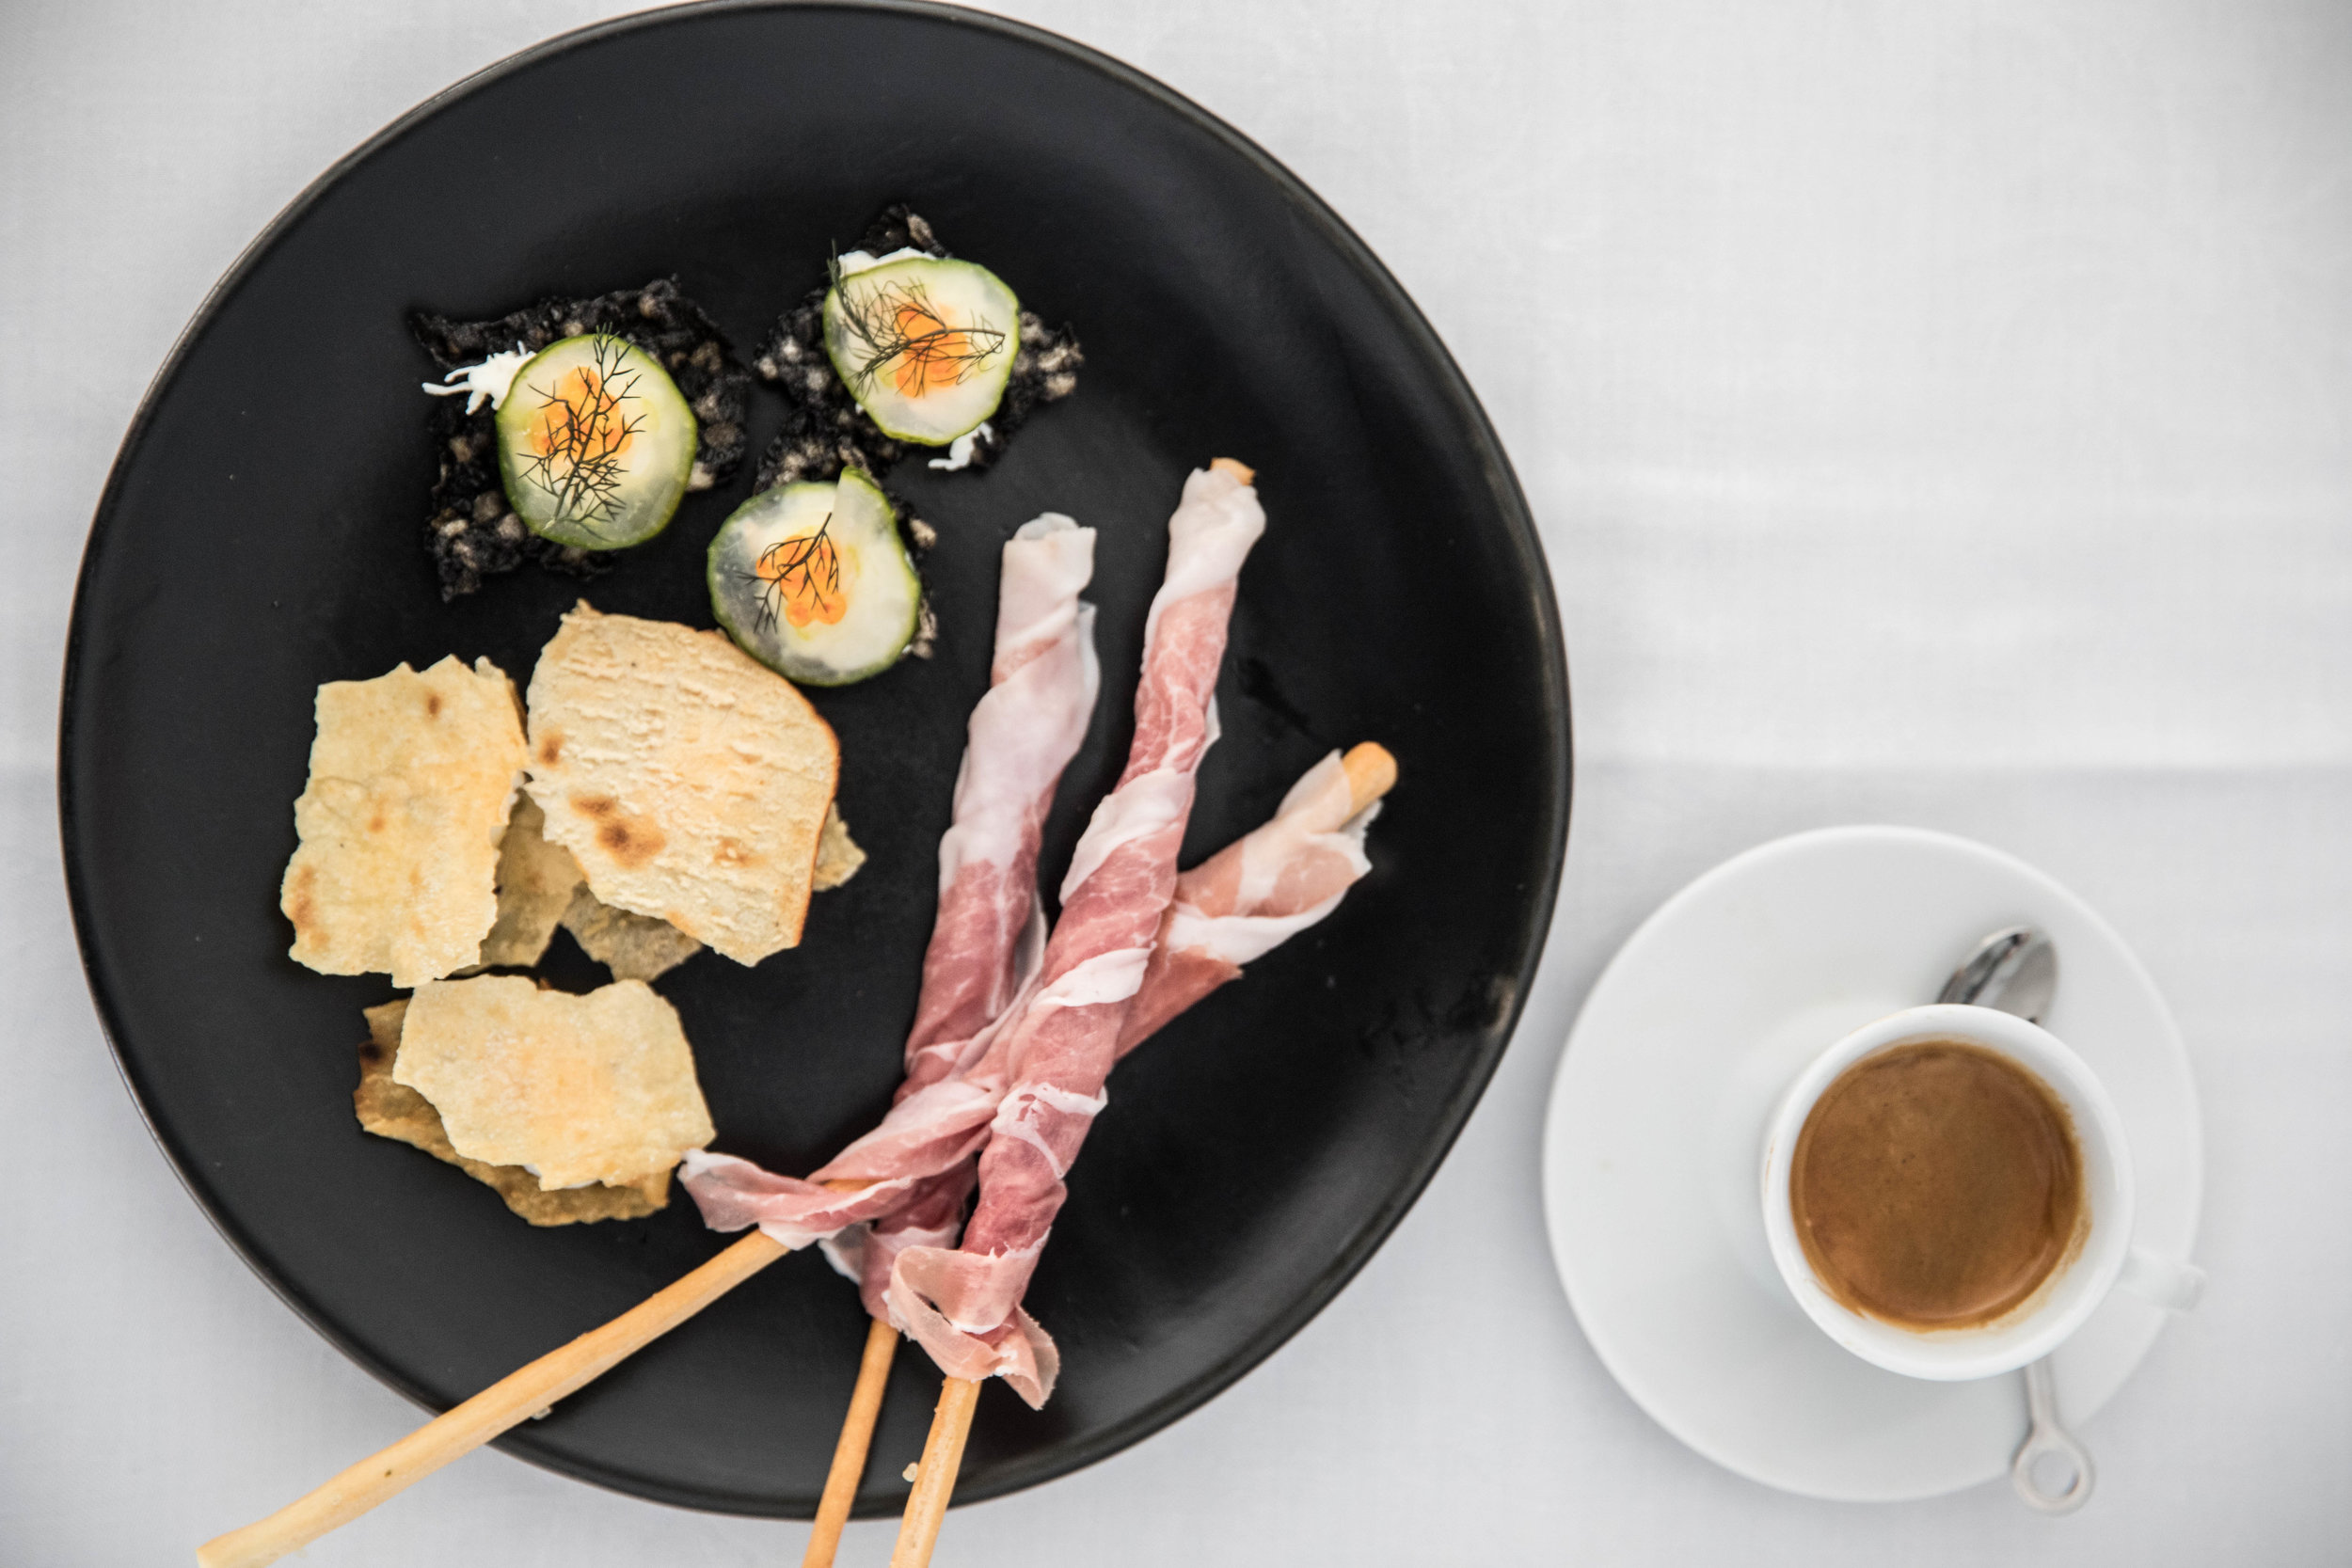 lavazza-massimo-bottura-worlds-50-best-restaurants-awards-2017-otto-canapes-5.jpg